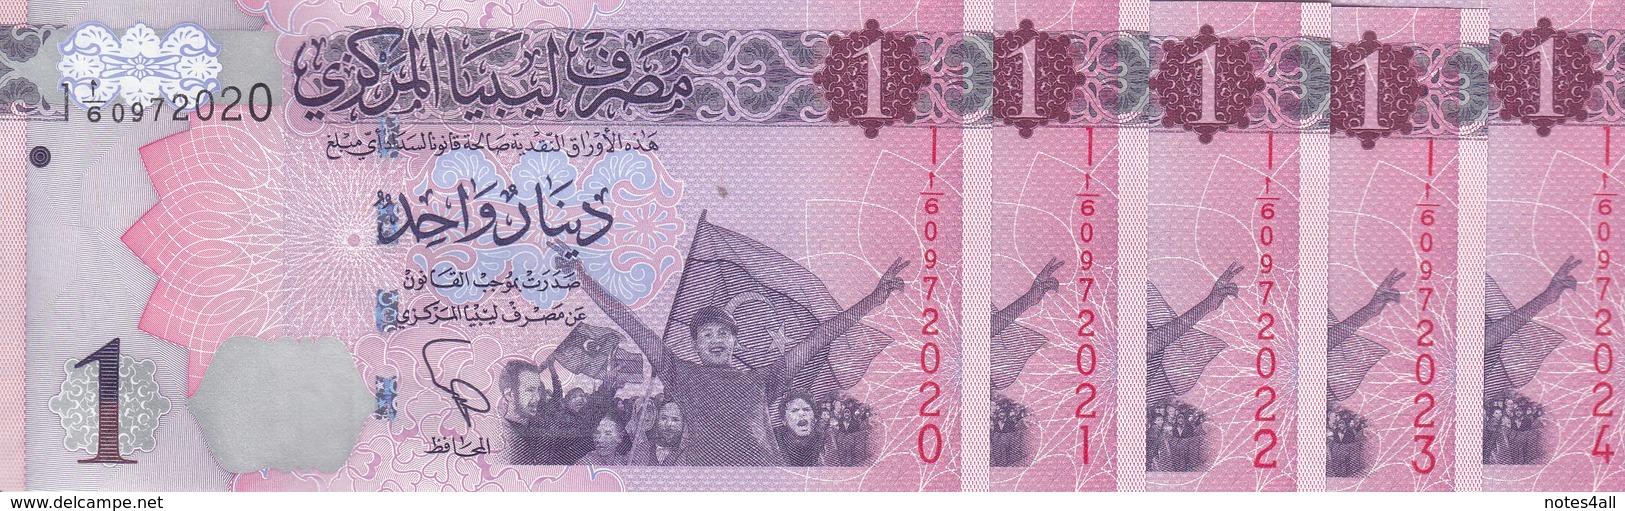 LIBYA 1 DINAR 2013 P-76 Lot X10 UNC Notes */* - Libye